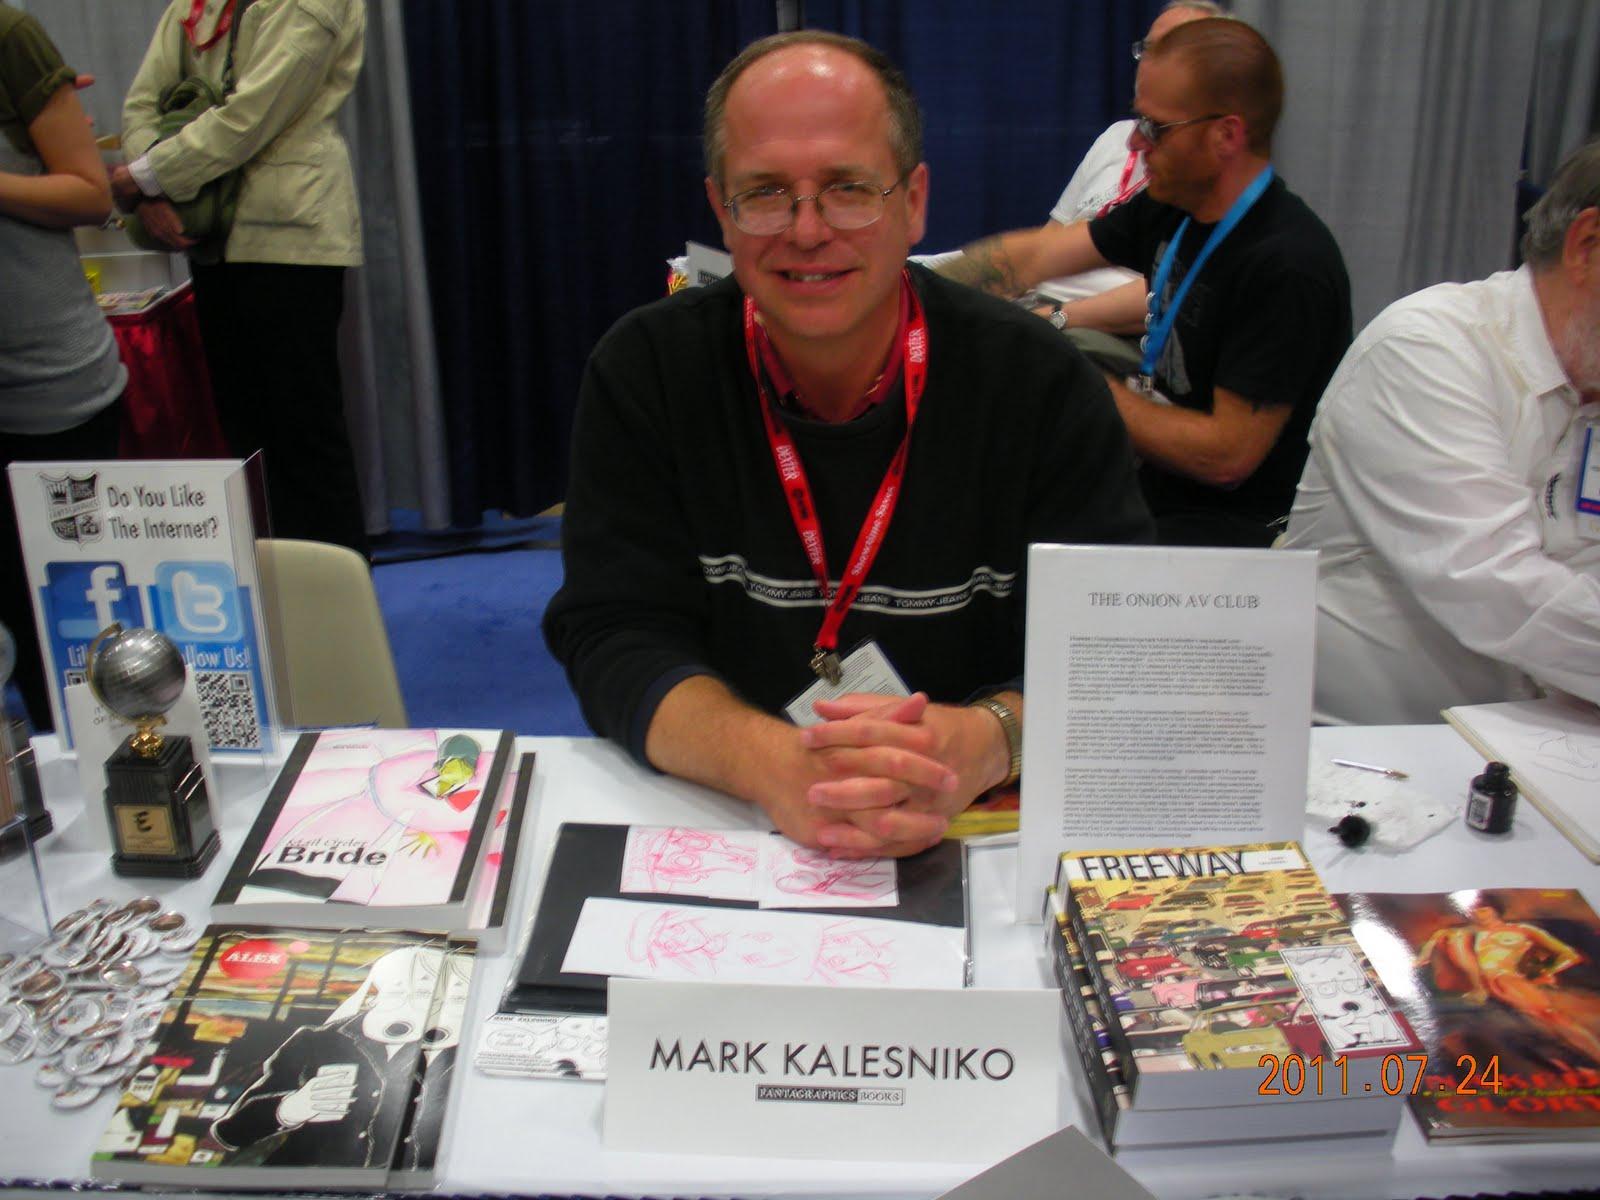 Stripovi o Alexu Kalienki i drugi radovi Marka Kalesnika DSCN6583